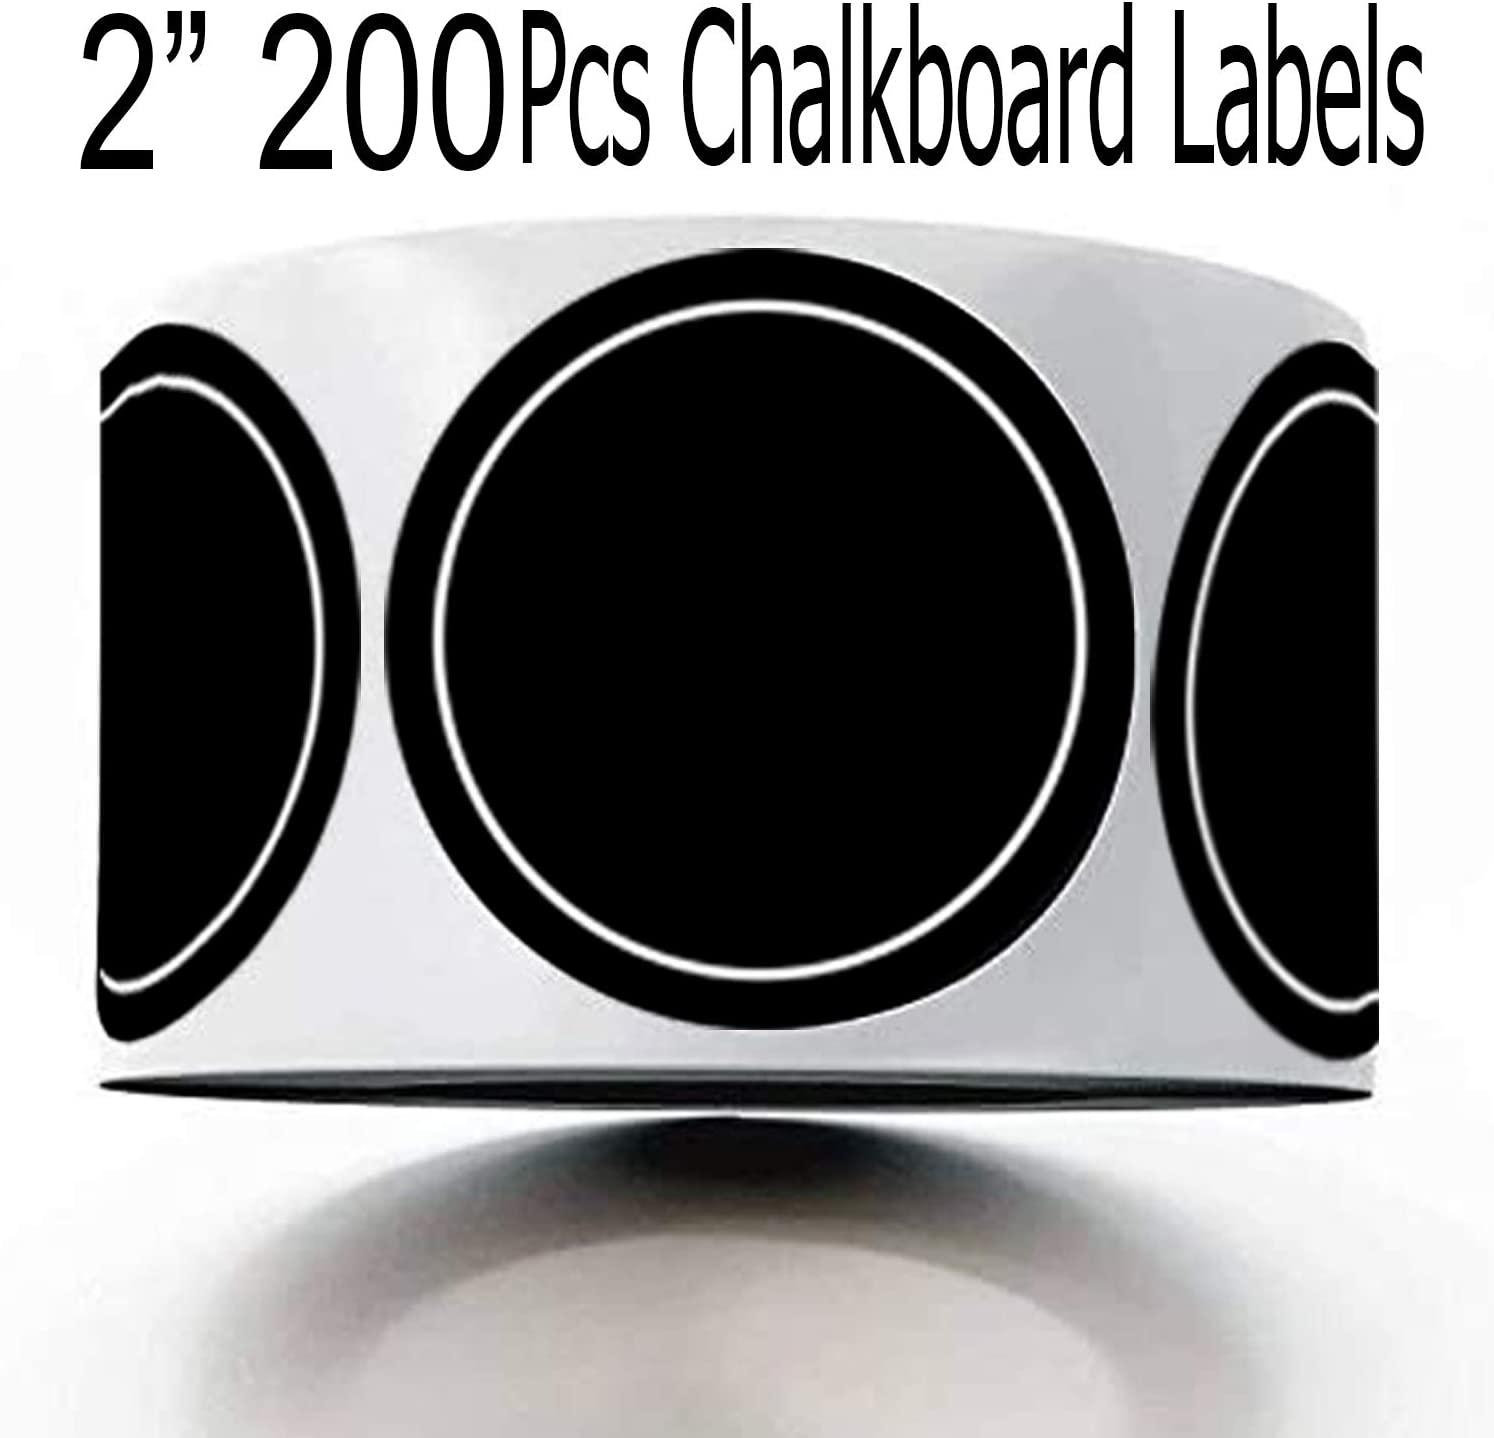 200 Blank Spice Jars Labels - 2